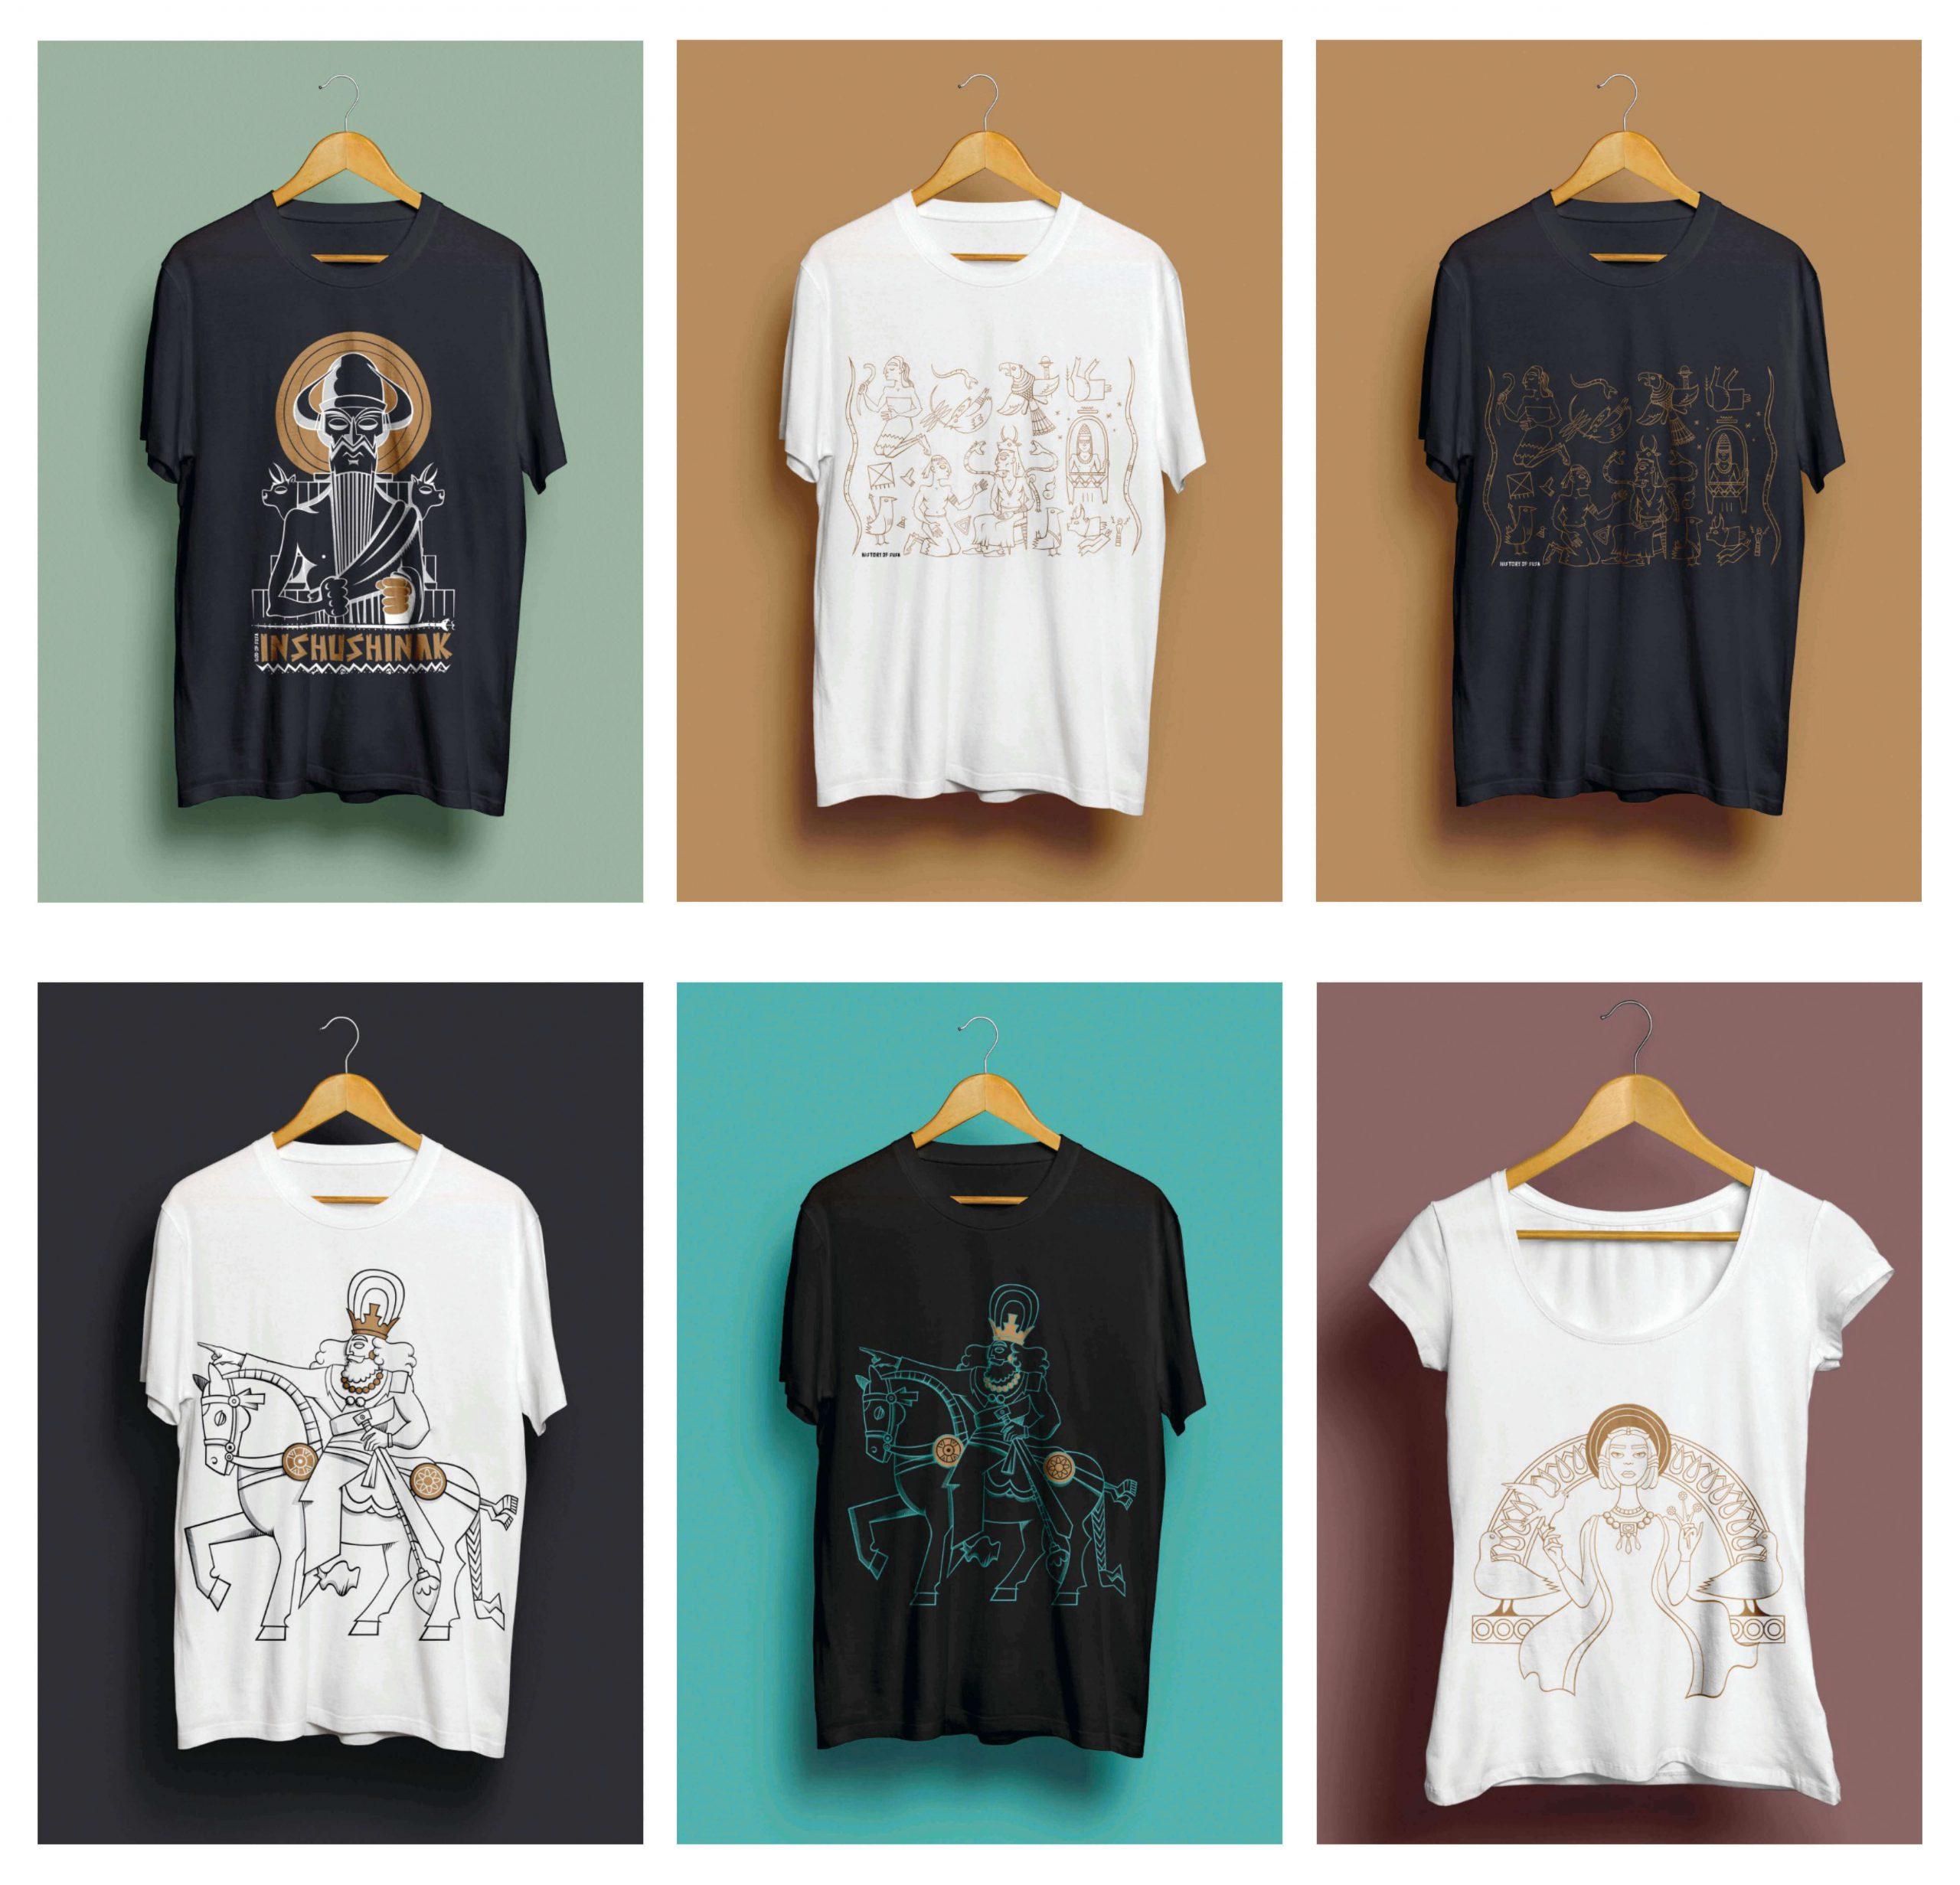 T-shirt printing خدماتی از وب سایت چاپ رازک https://chaprazak.ir